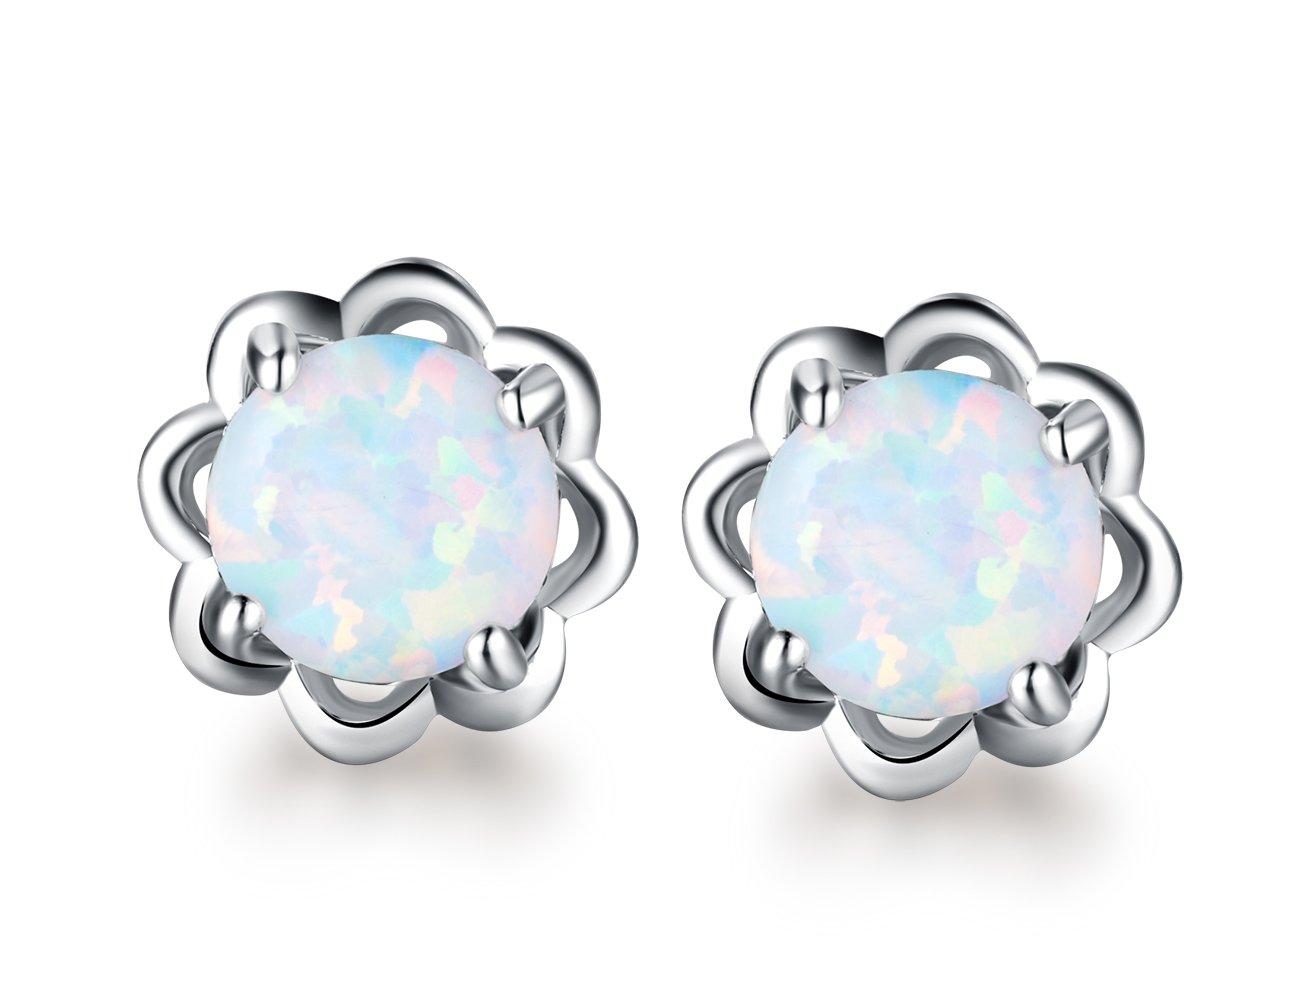 Opal Lotus earrings-18K White Gold Plated 6mm Round White Opal Stud Earrings For Women Girls …